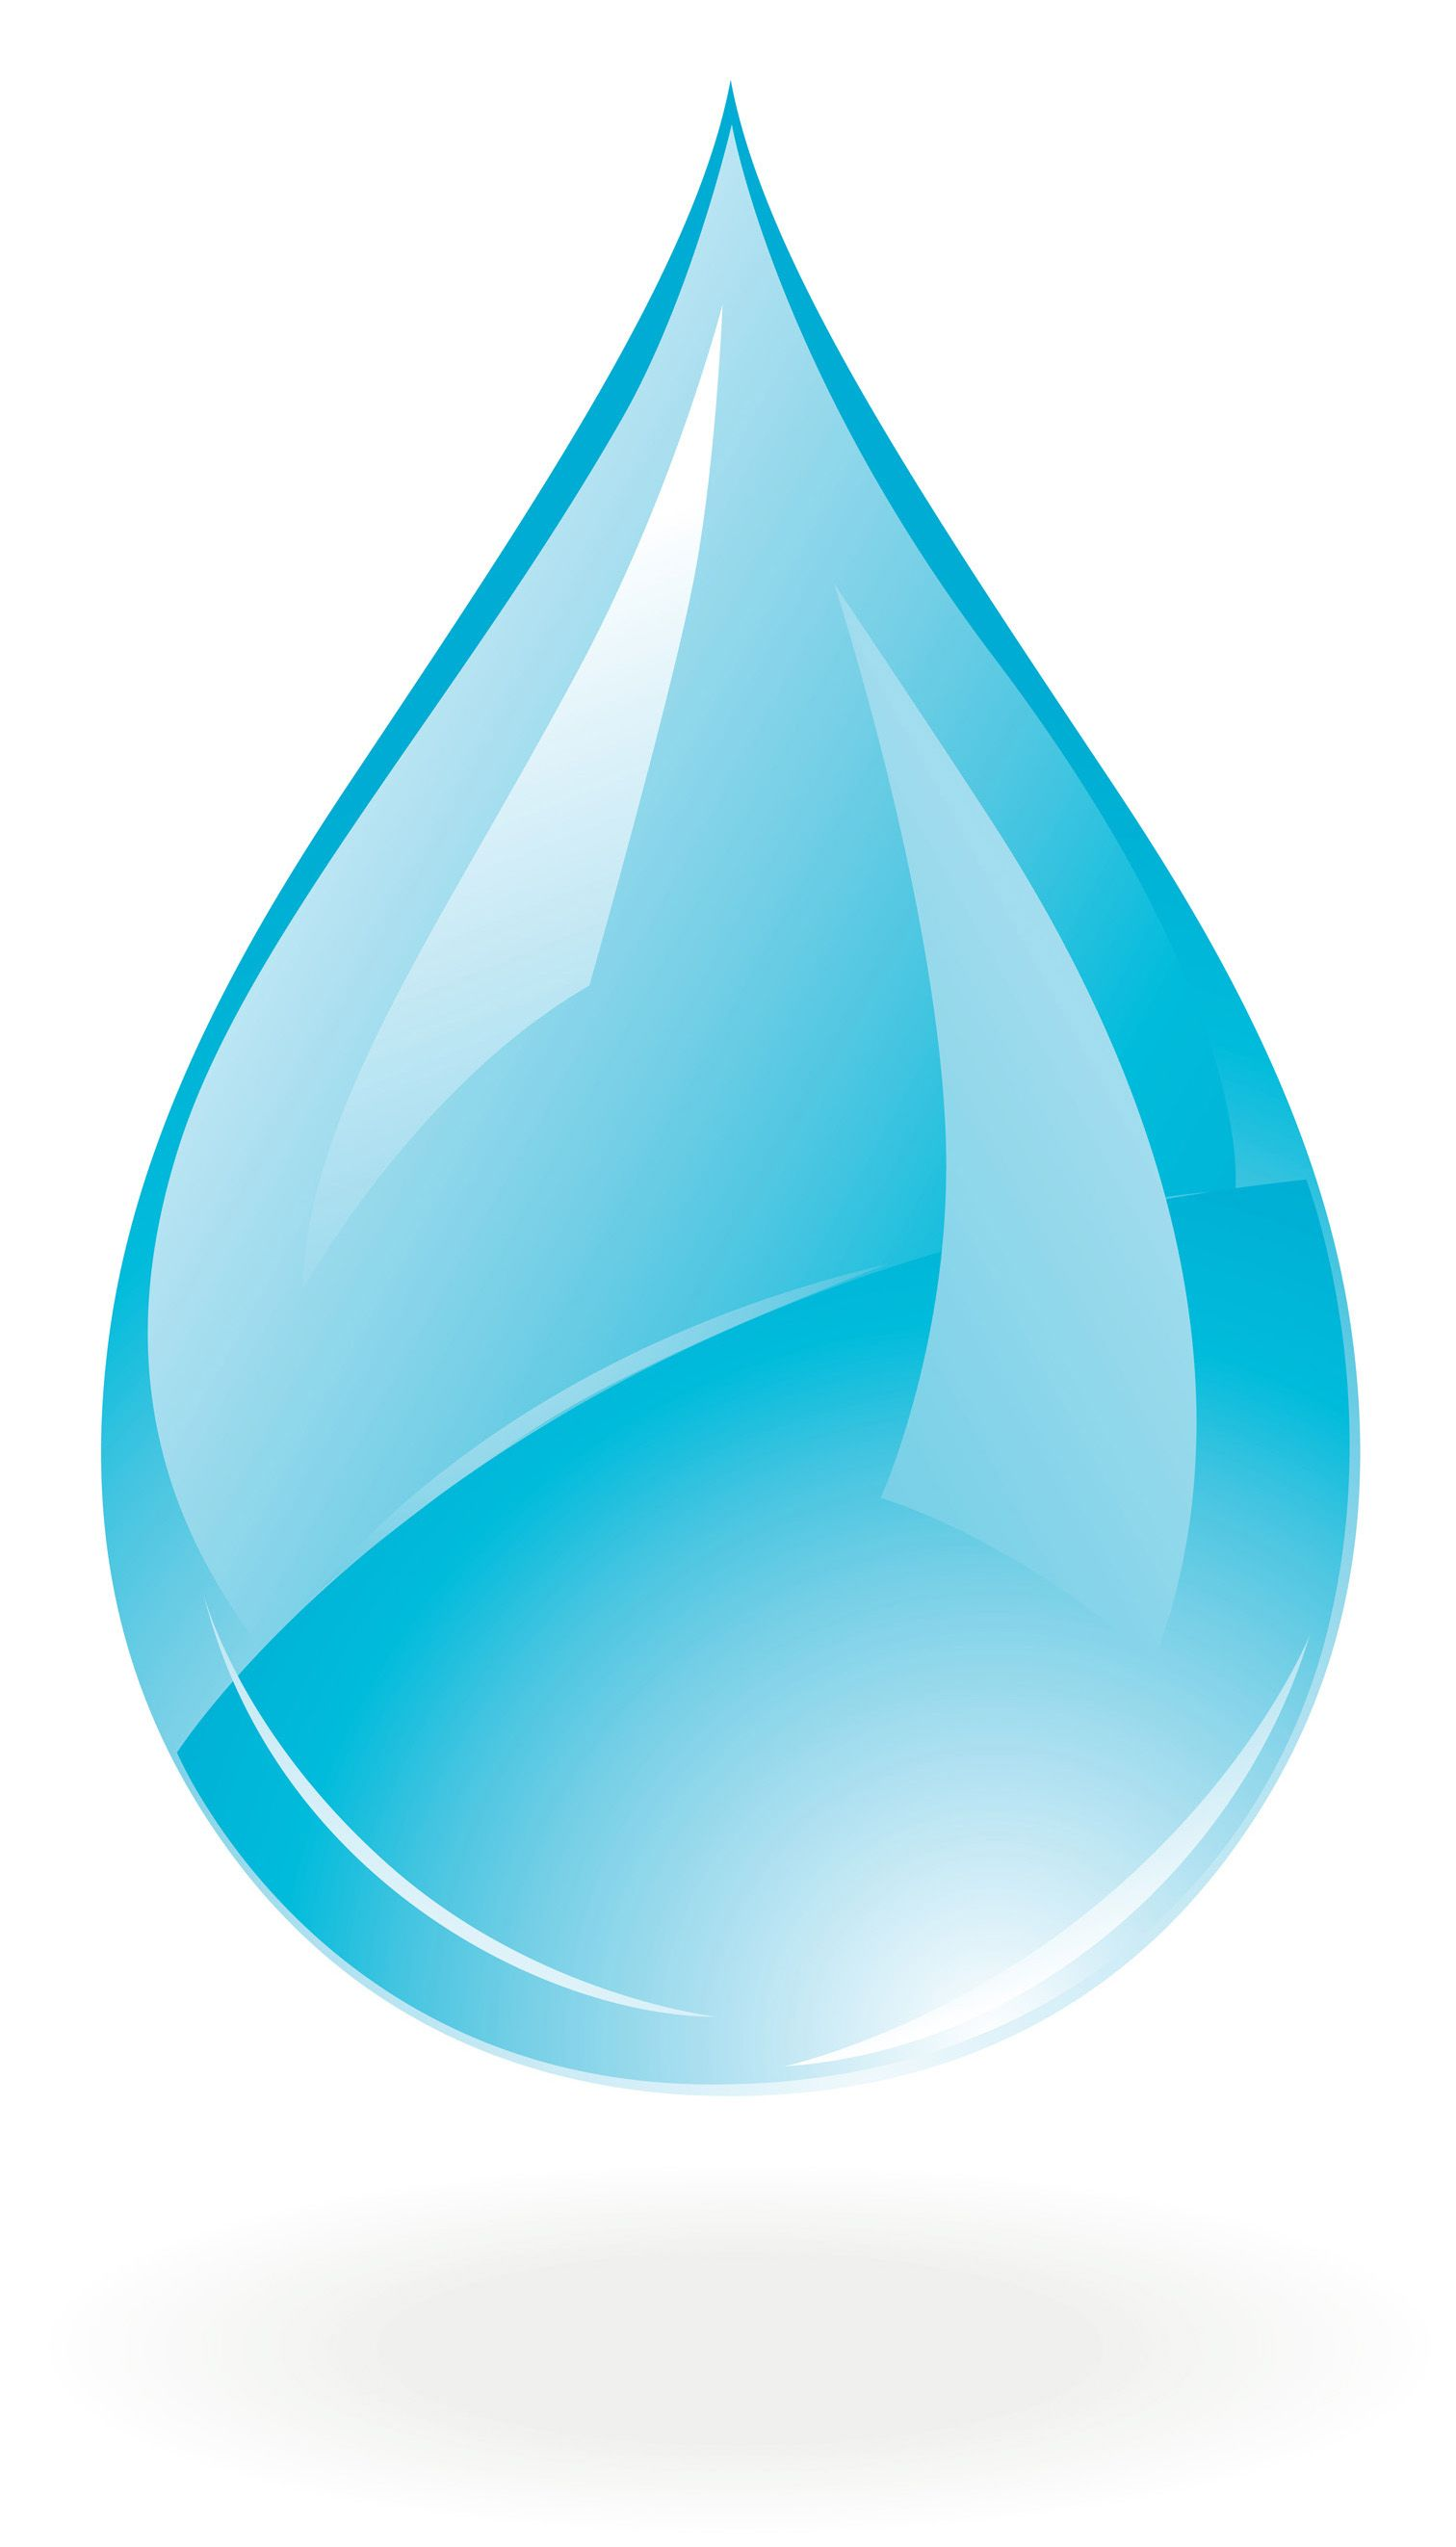 water drop psd clipart [ 1512 x 2645 Pixel ]